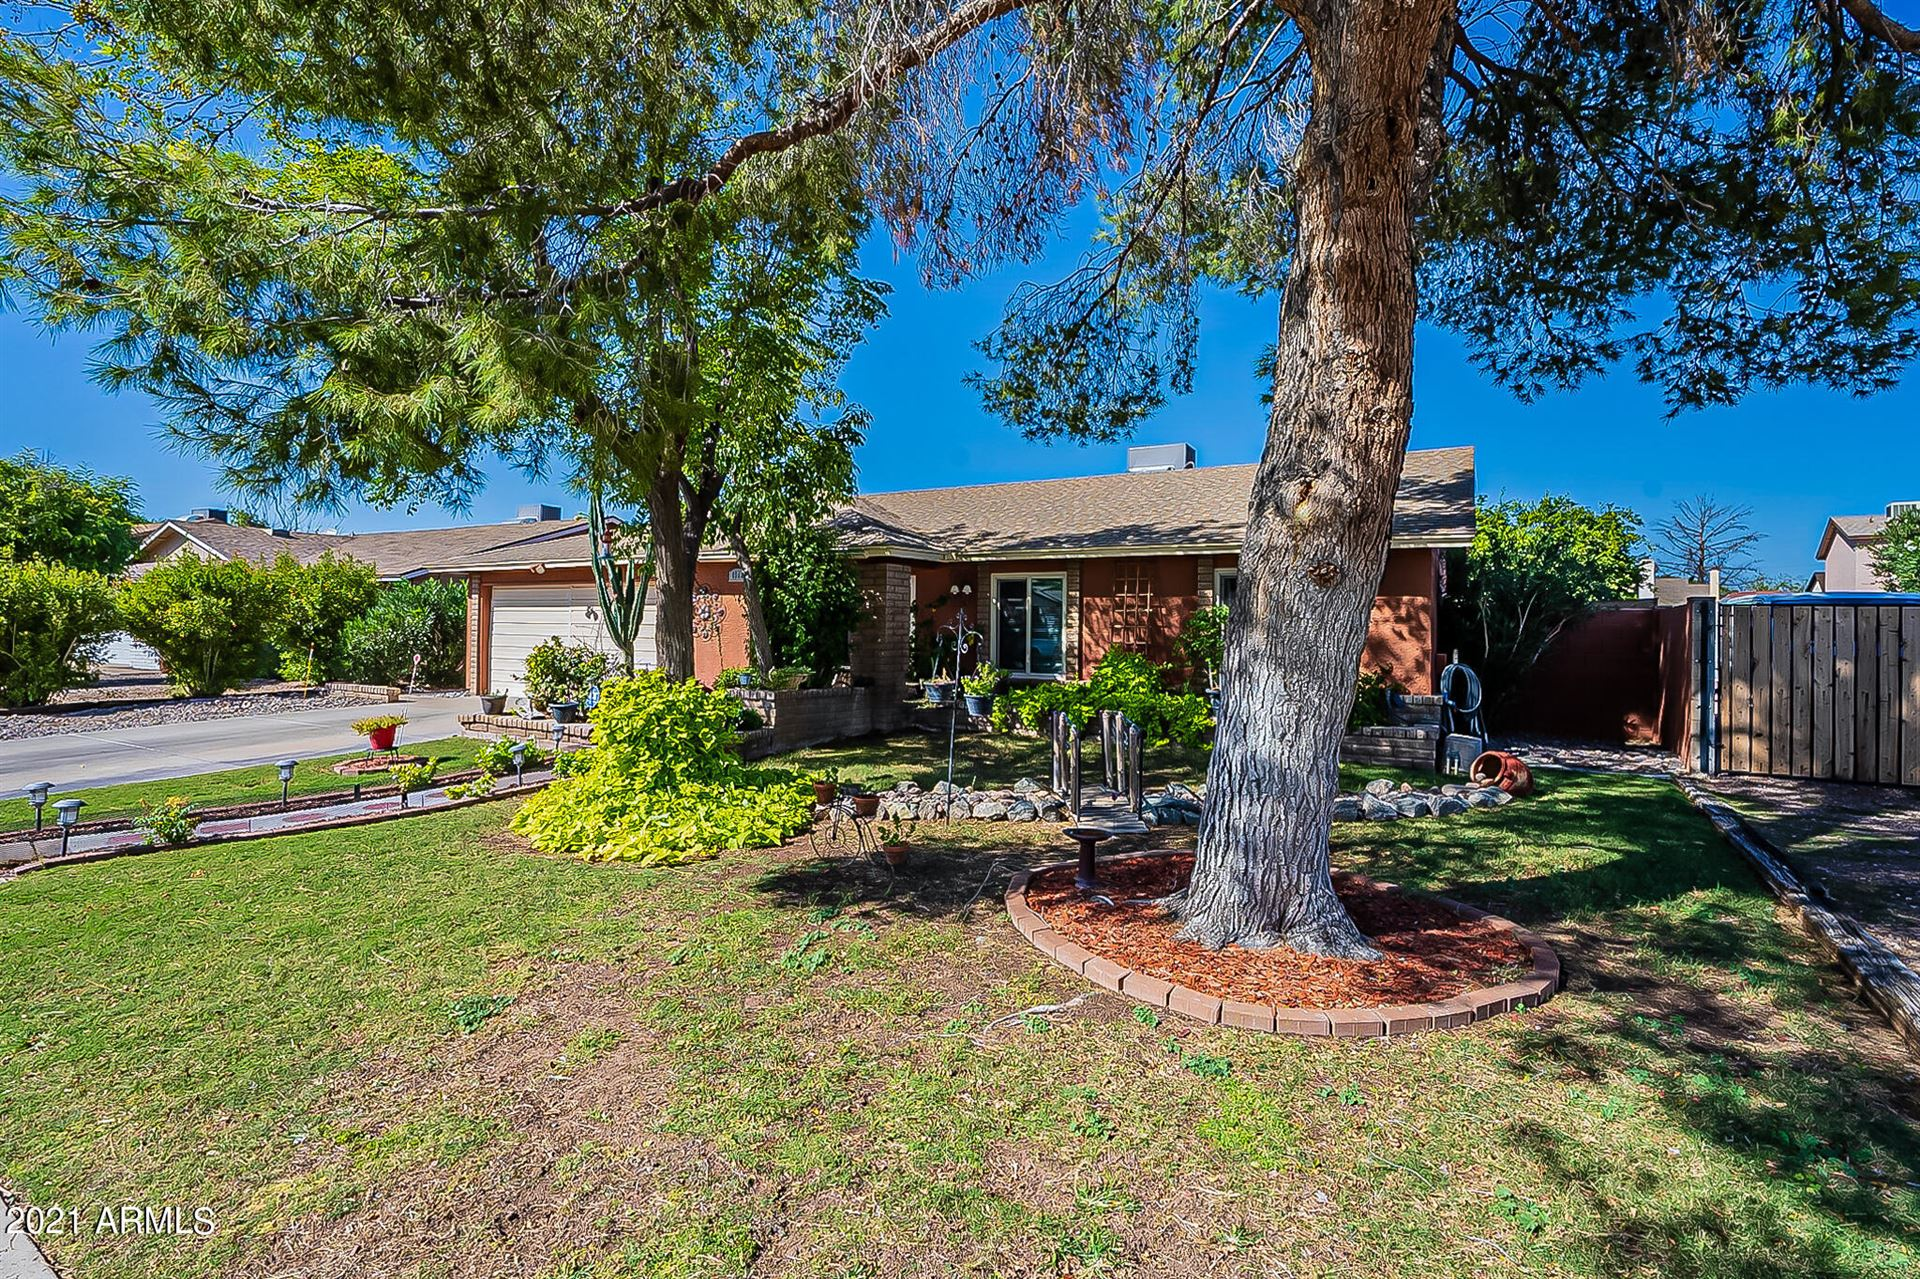 Photo of 1608 W CHILTON Street, Chandler, AZ 85224 (MLS # 6307205)